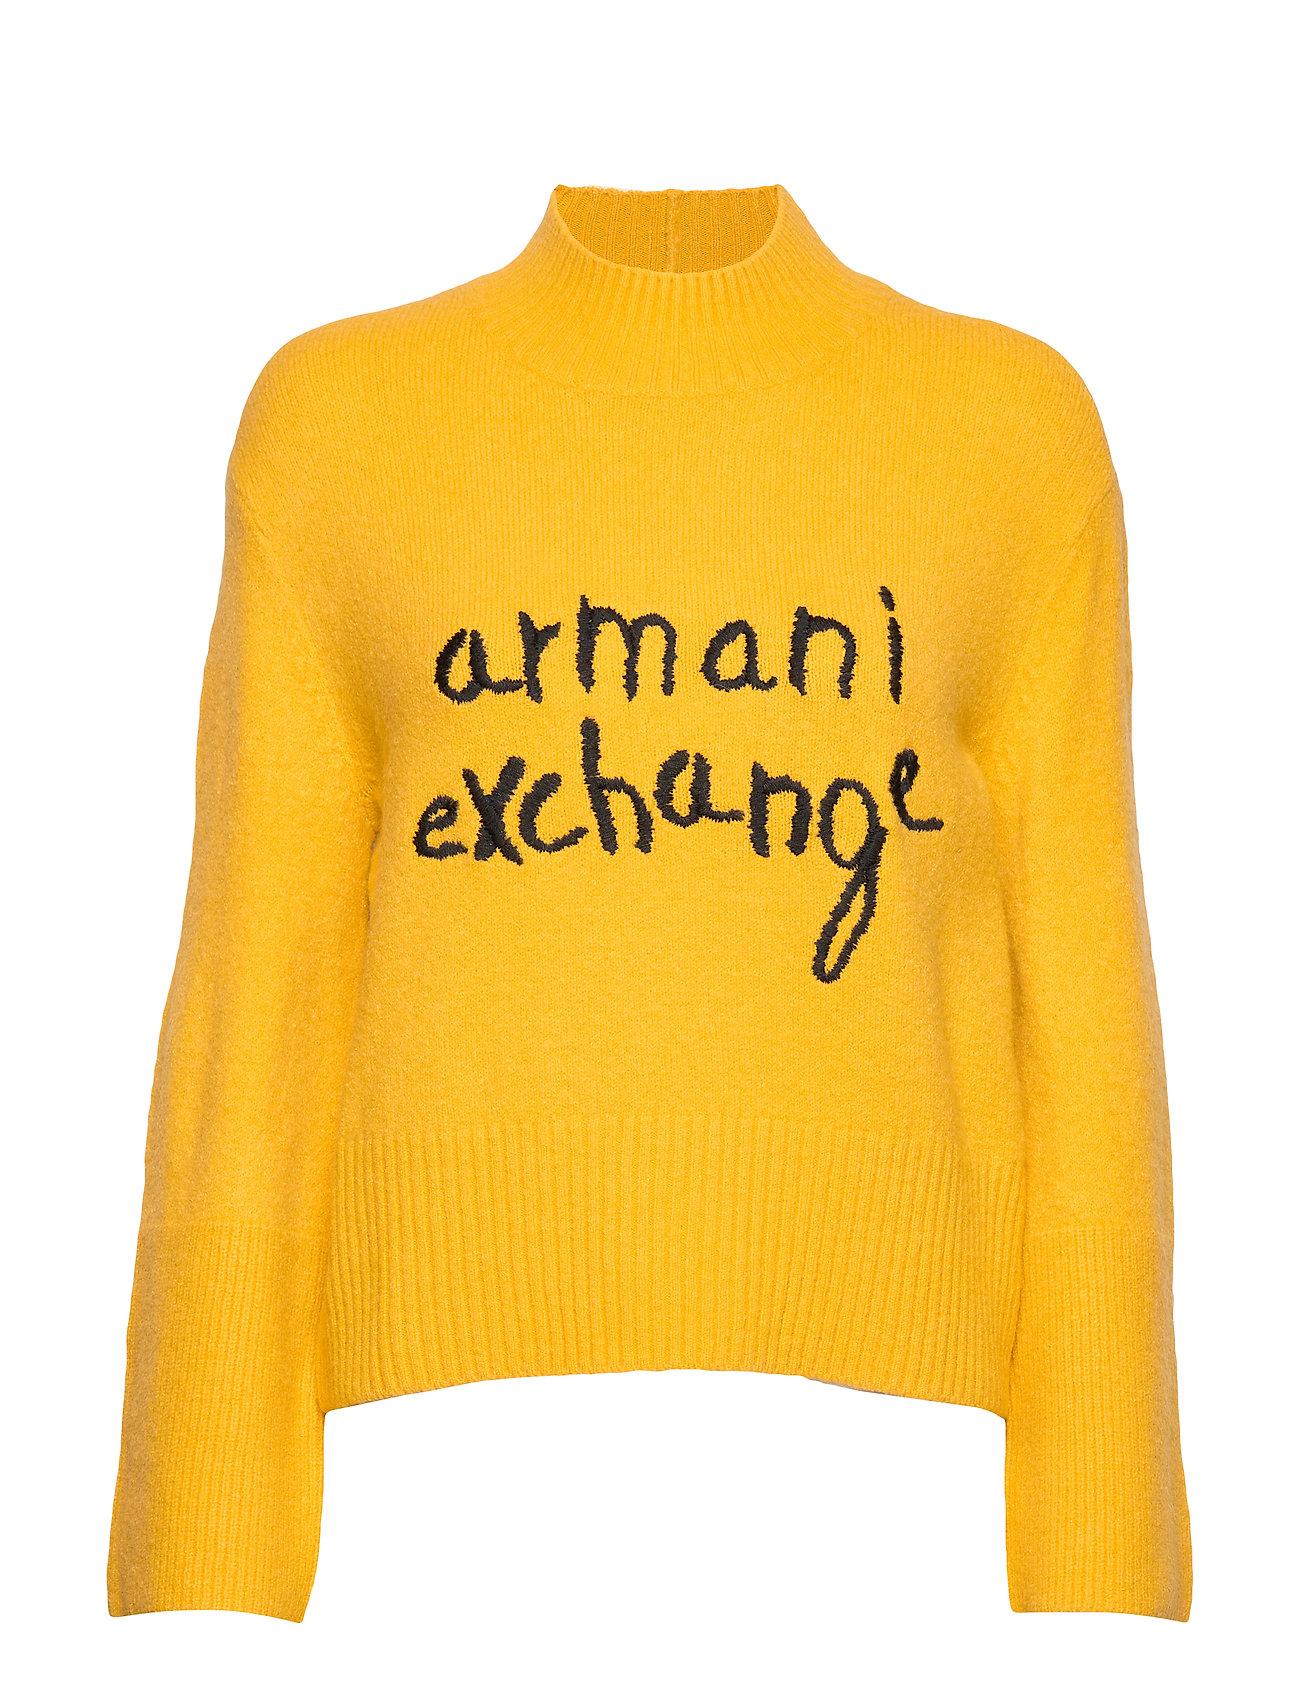 ARMANI EXCHANGE Ax Woman Sweather Strickpullover Gelb ARMANI EXCHANGE